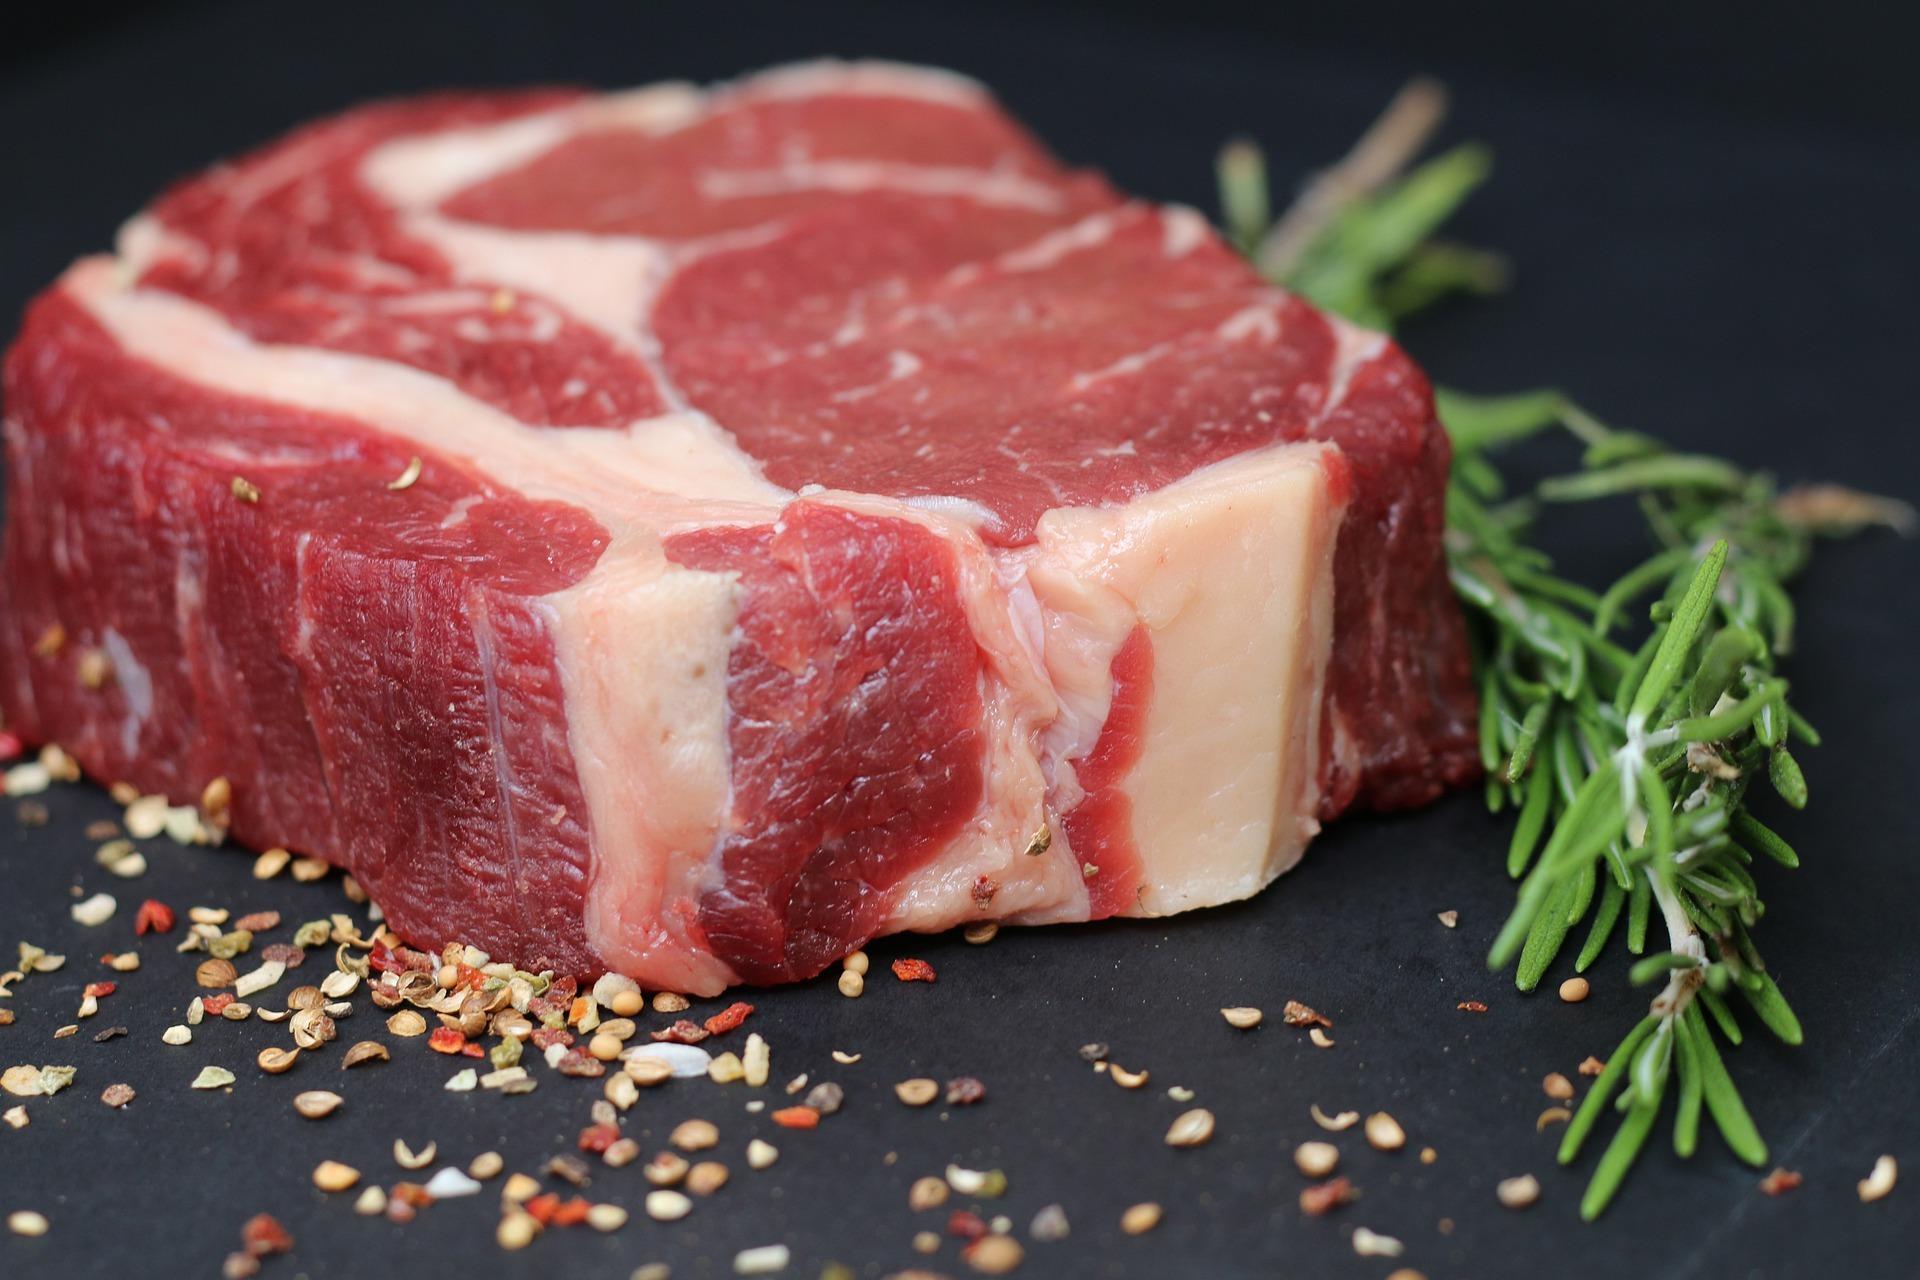 meat-3139641_1920.jpg